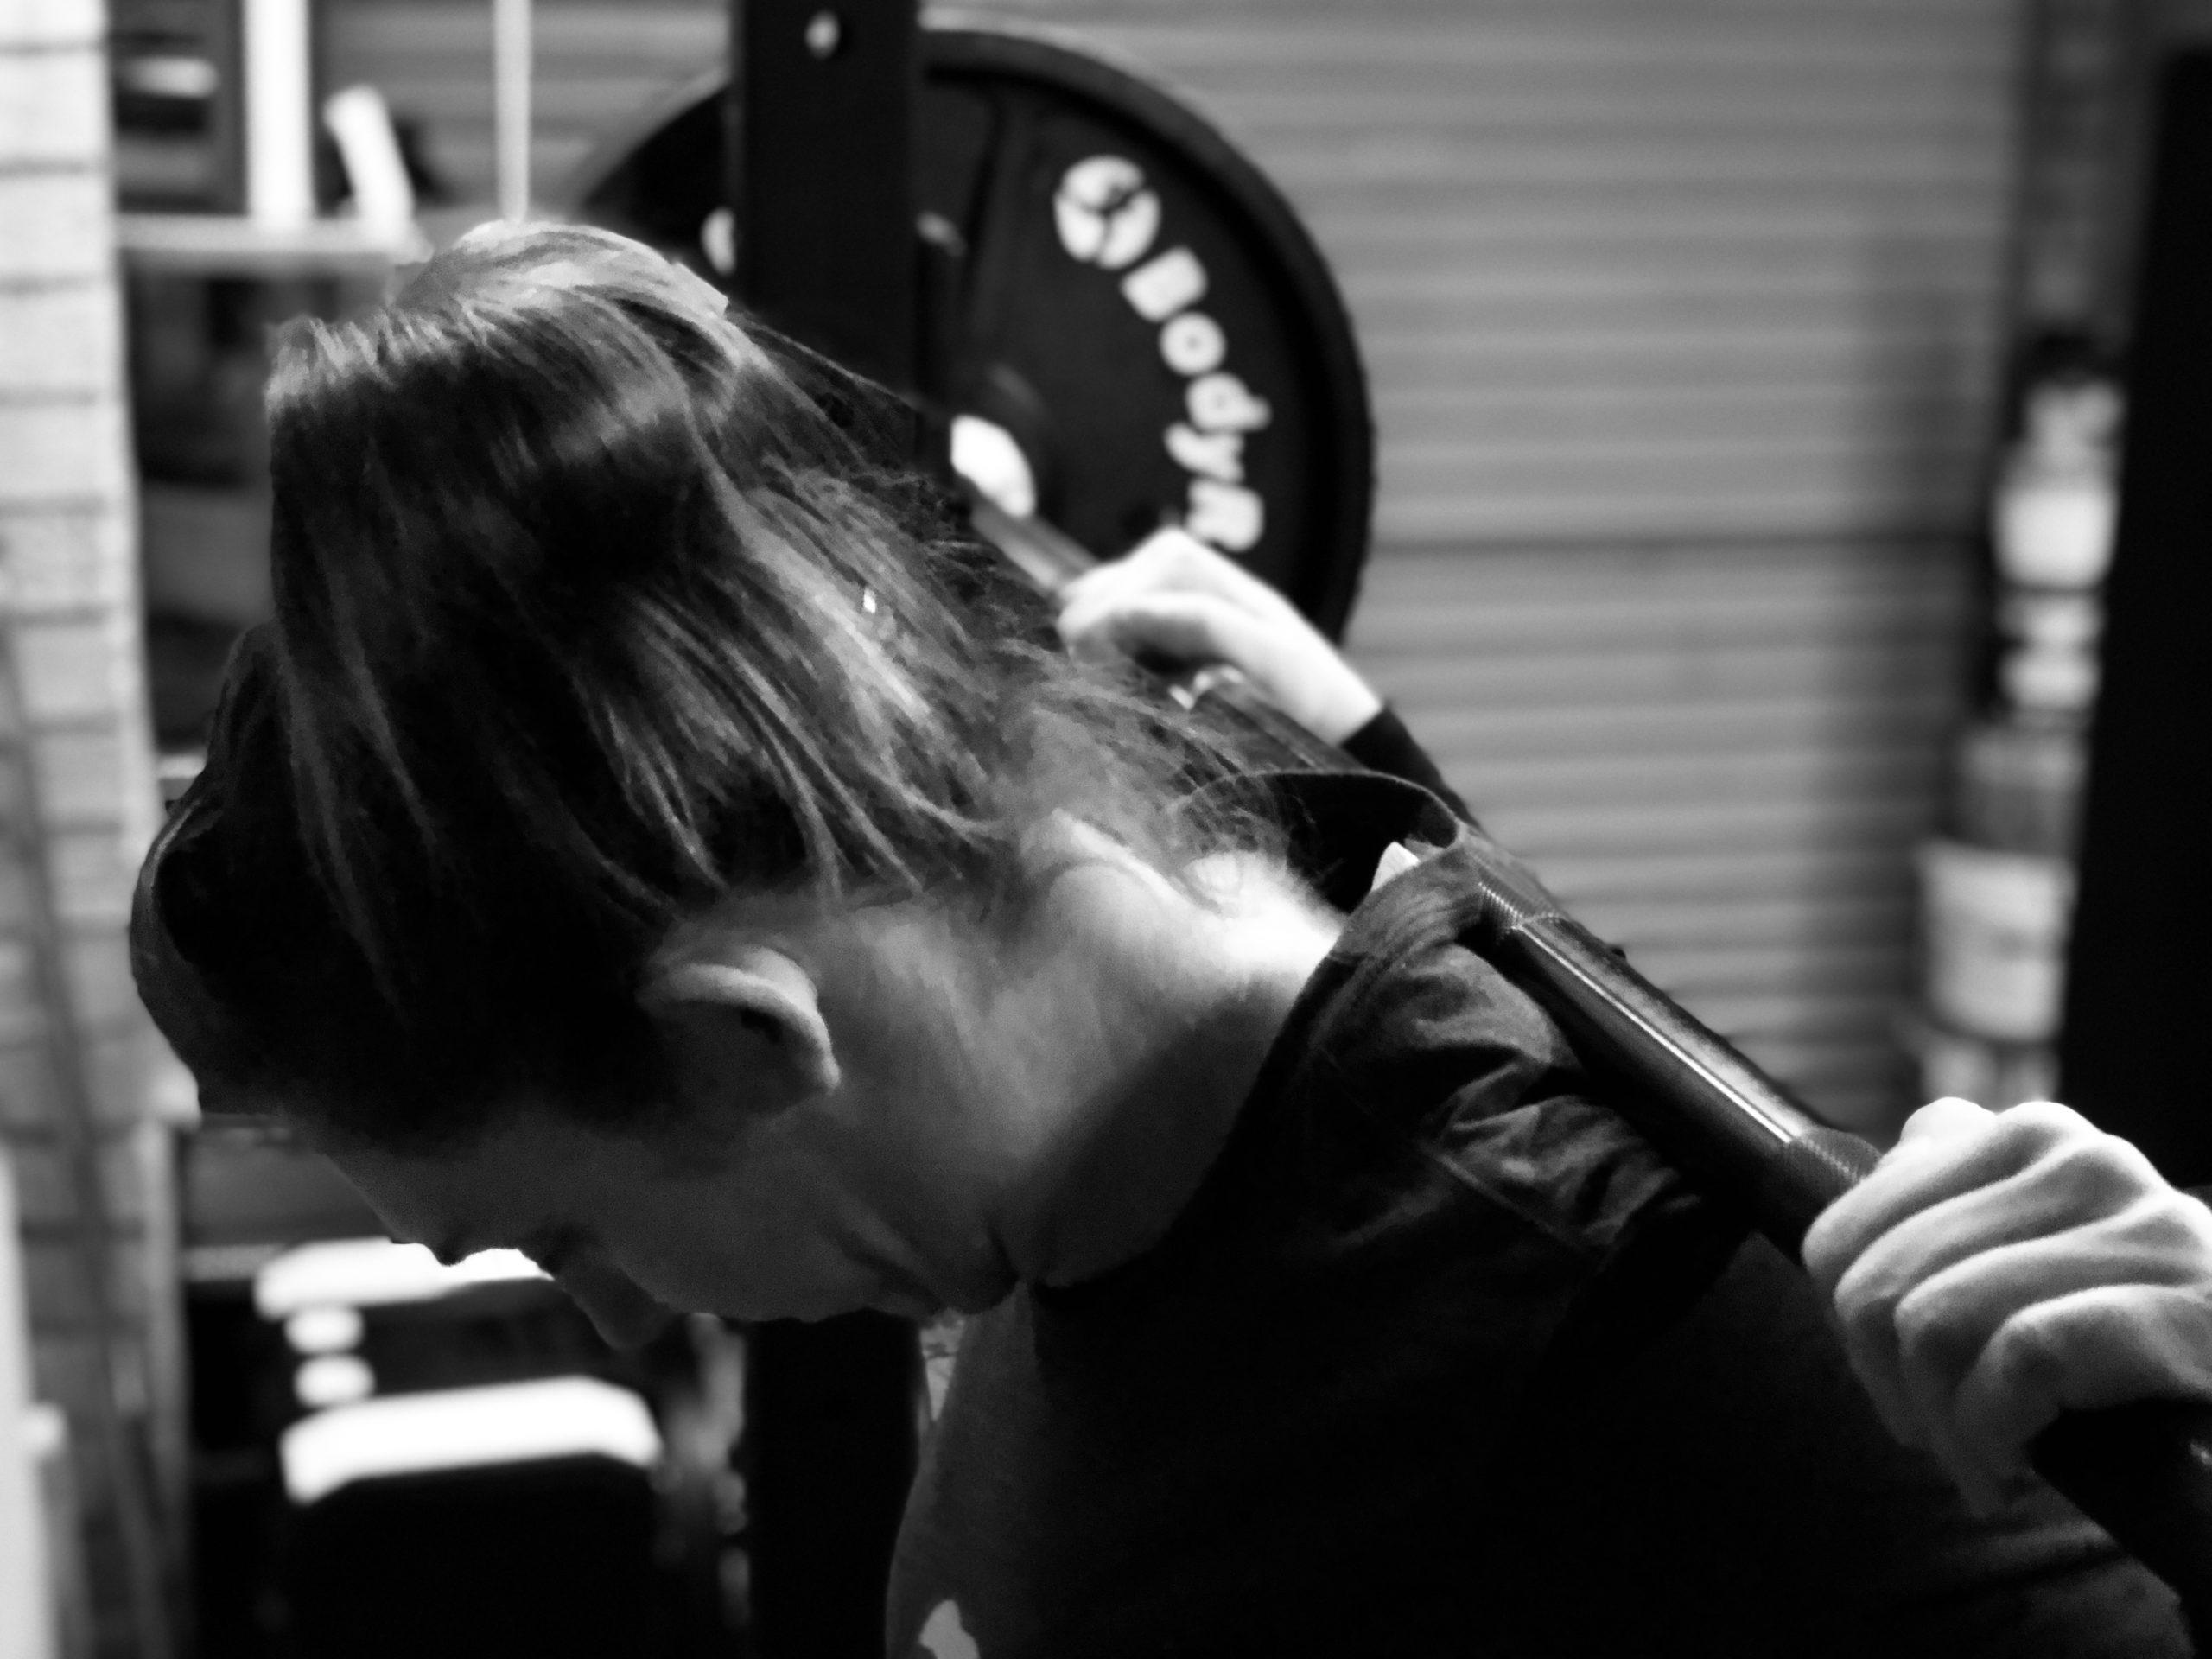 chrissy strength squat